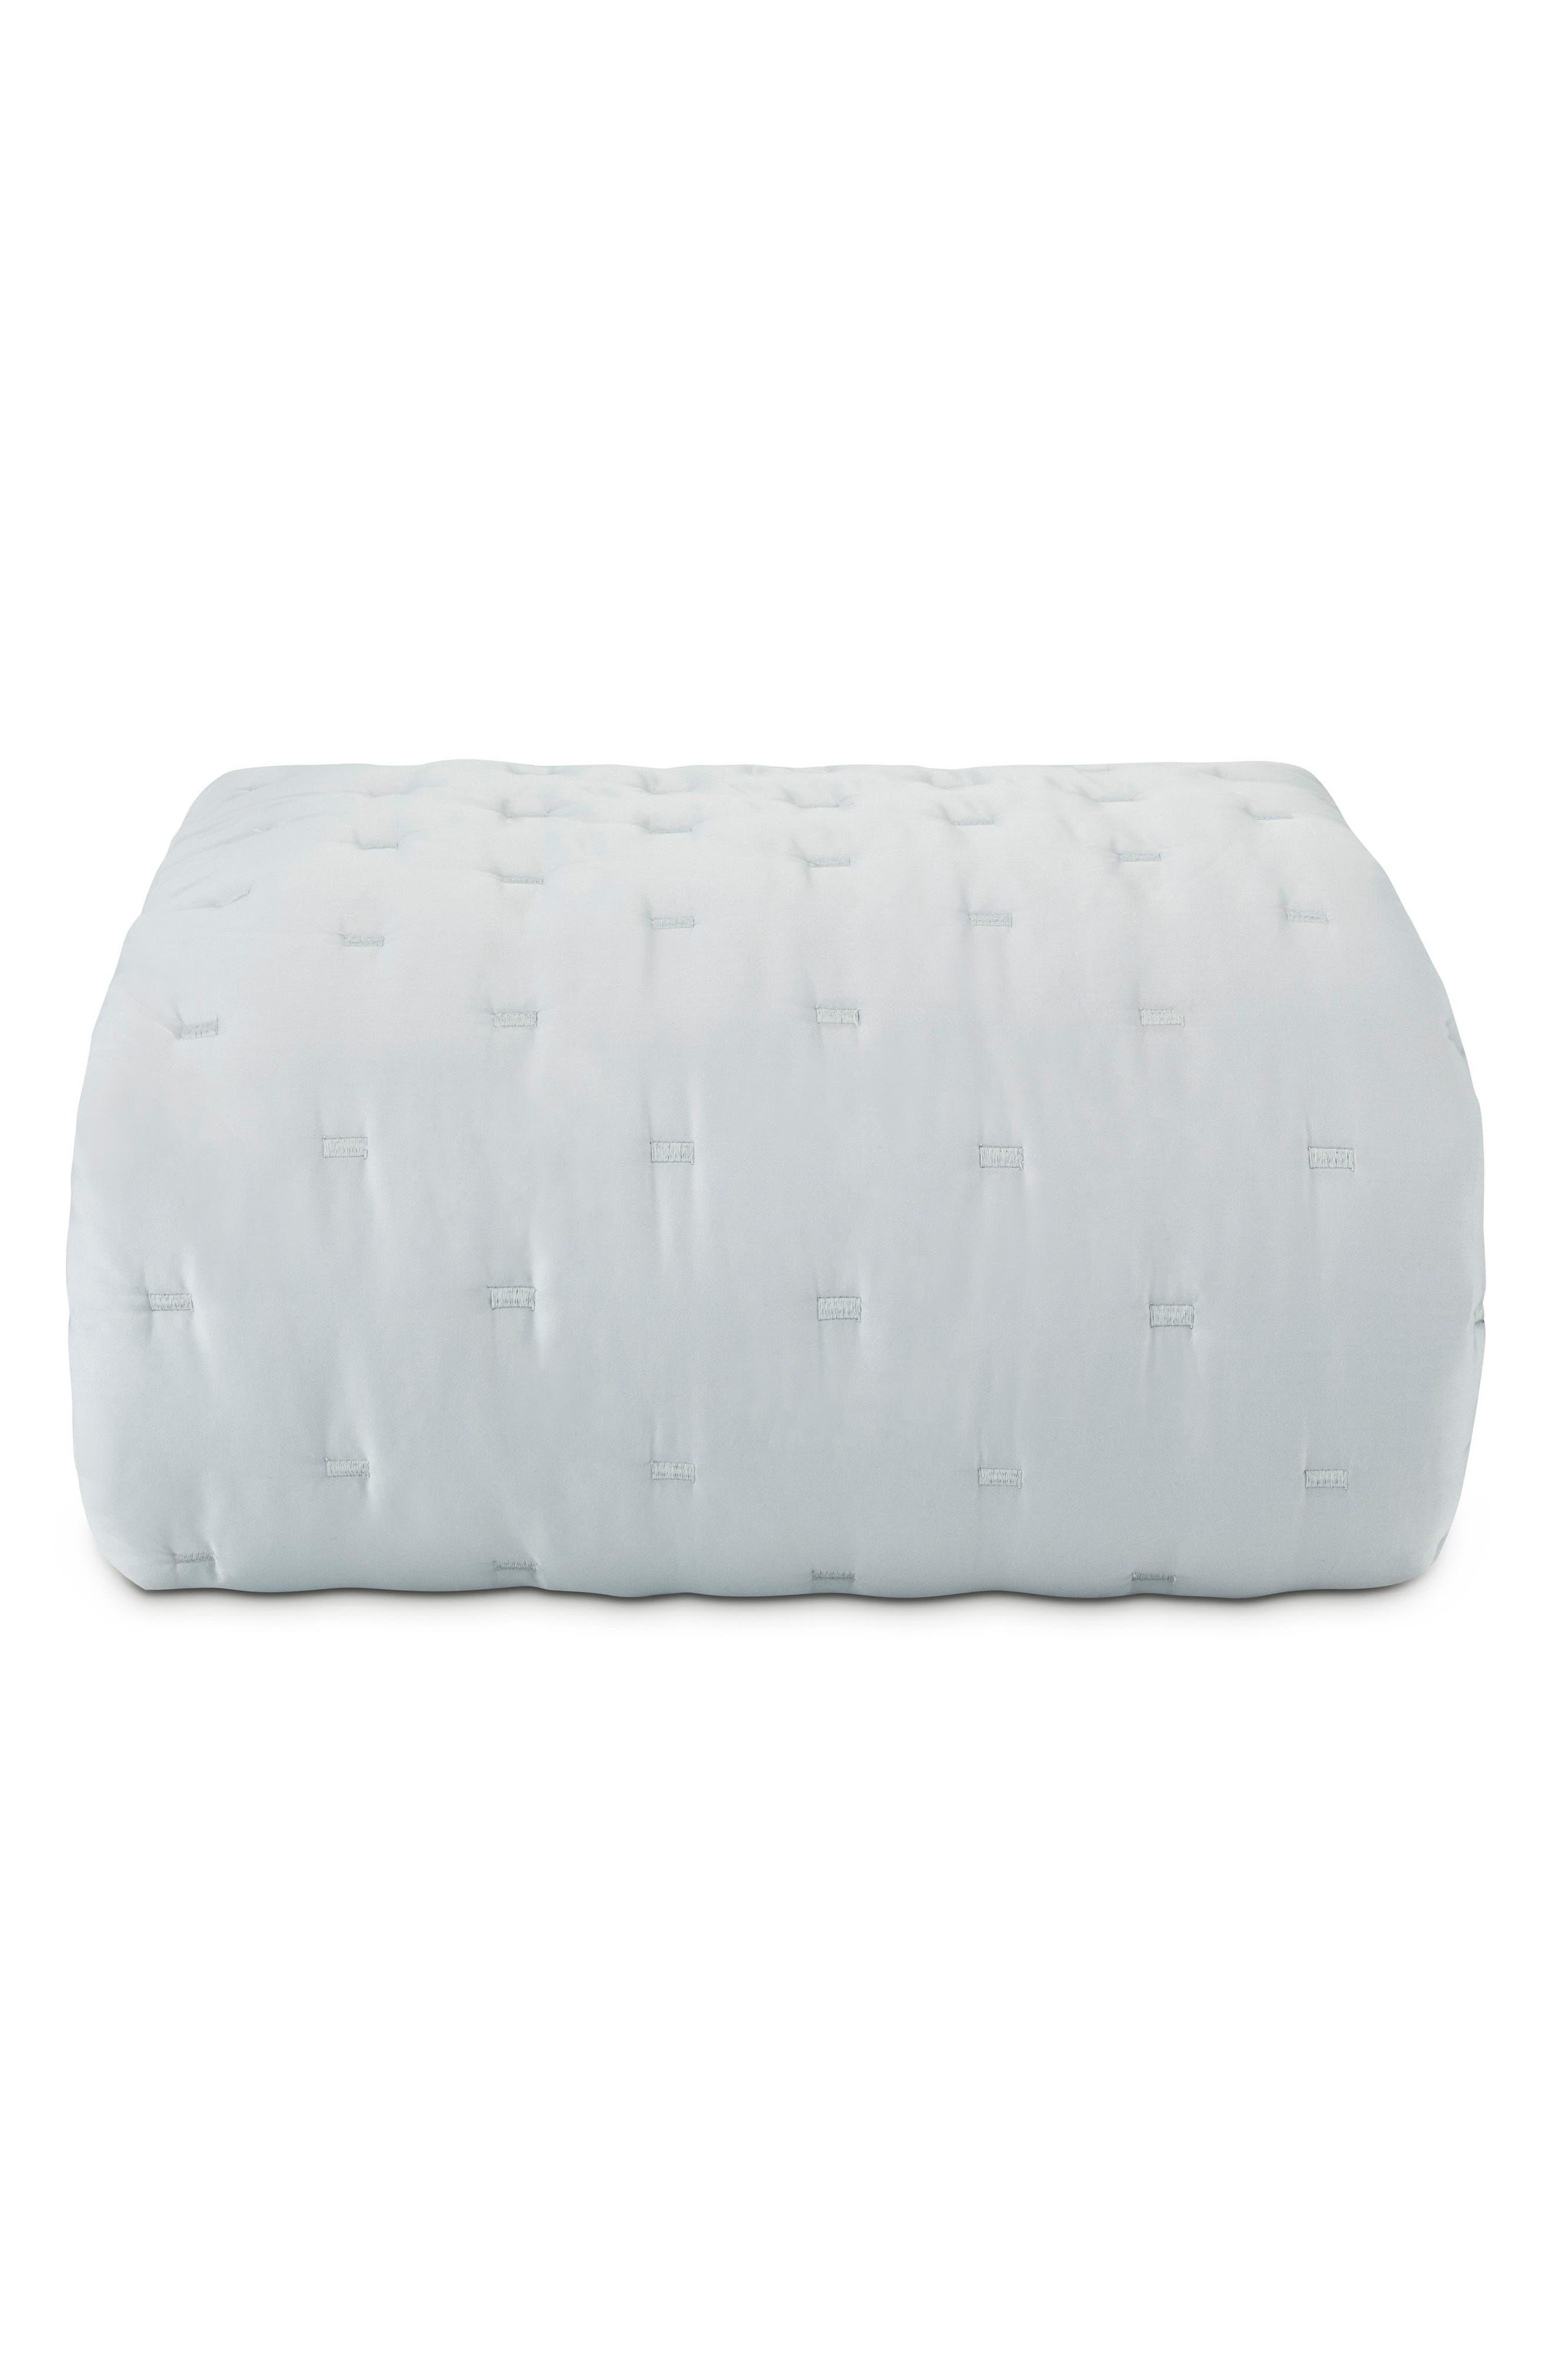 pillow serta queen mattress firm reviews home youtube vera best hybrid decoration top series super encourage posturepedic plush sealy allure basford wang mattresses